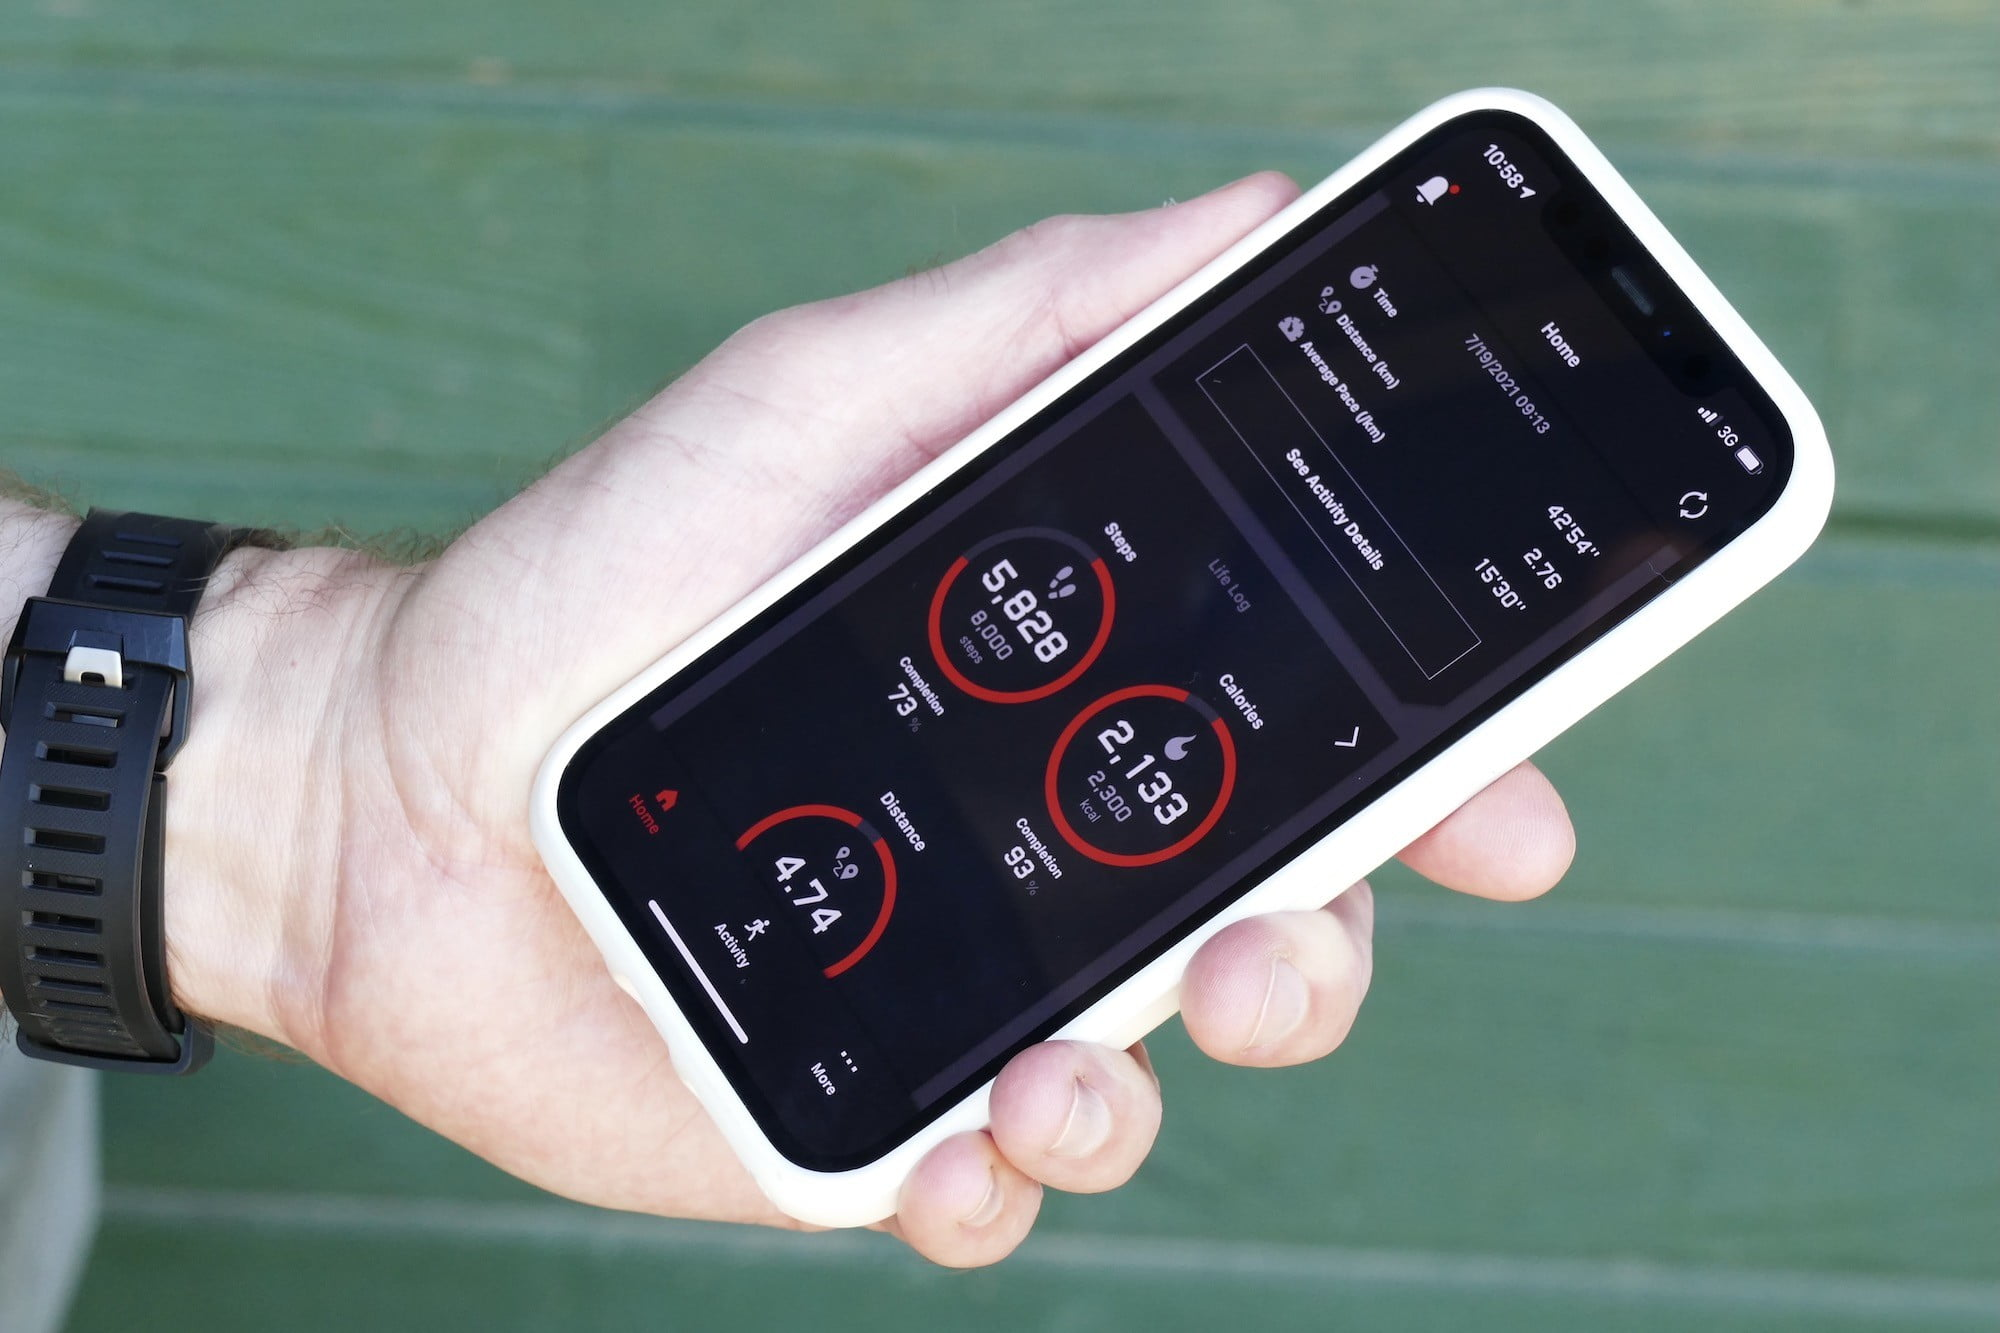 The G-Shock Move app main screen.